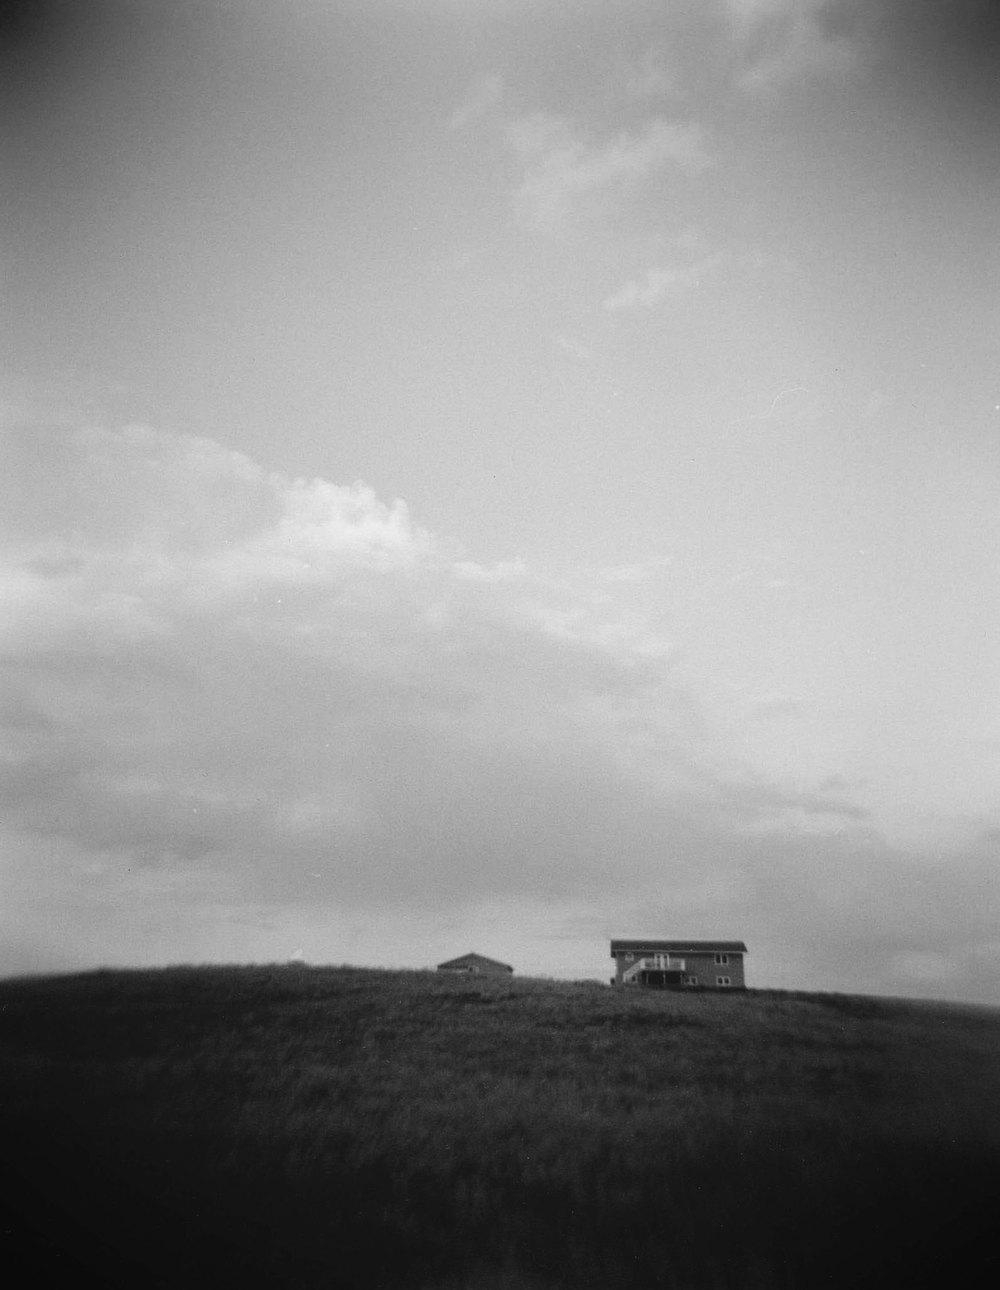 House | Holga 120N | dan miller